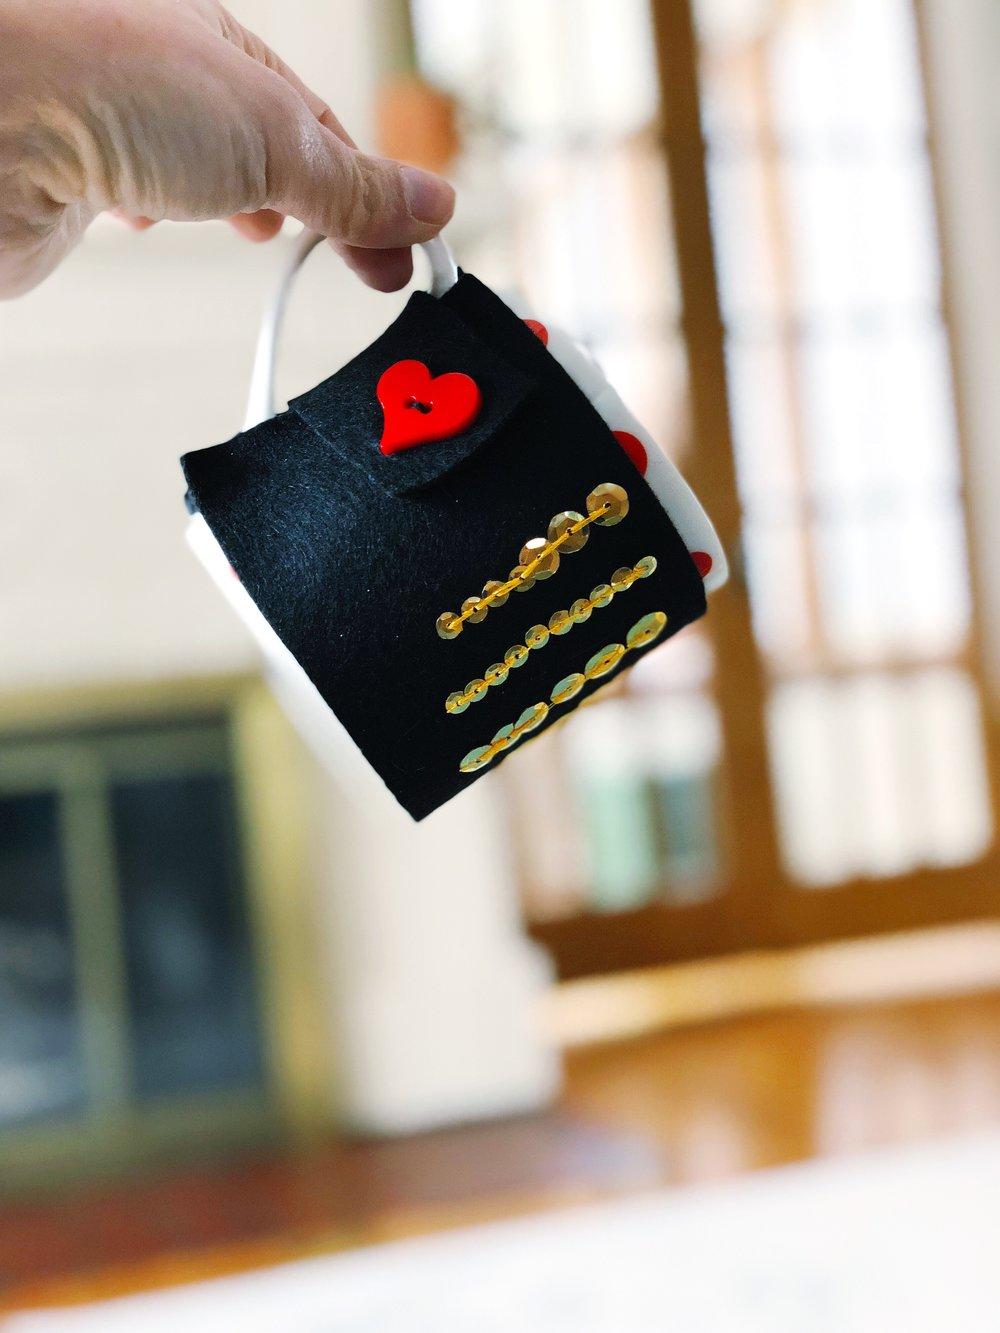 RBG Dissent CollarCoffee Cozy heart button.jpg